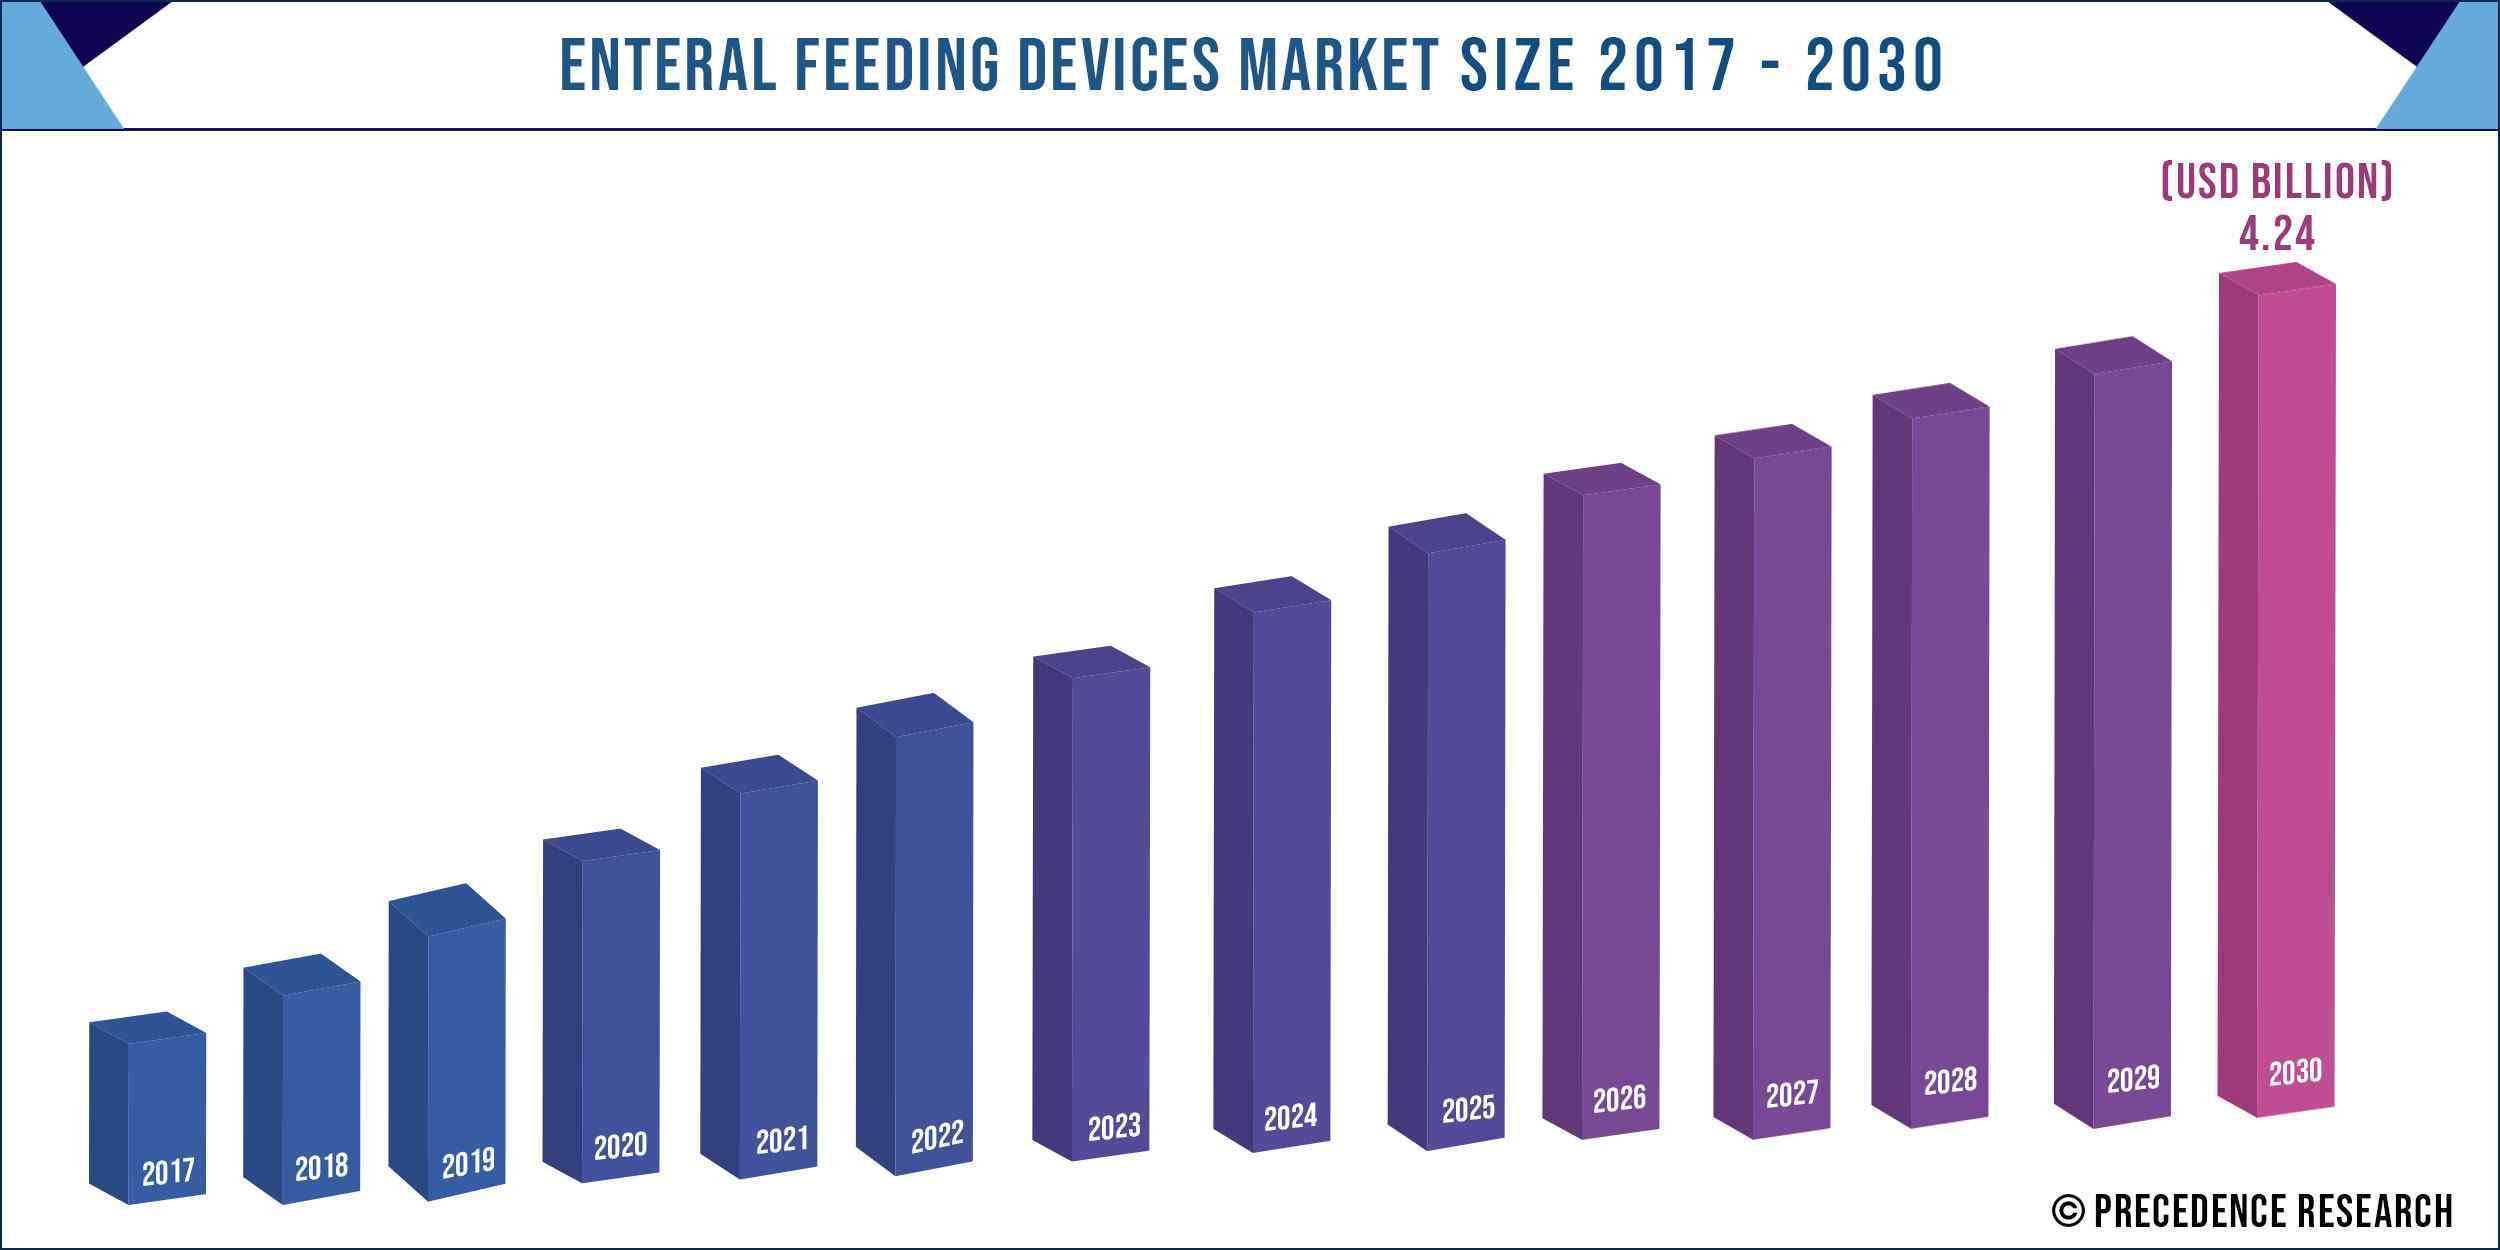 Enteral Feeding Devices Market Size 2017-2030